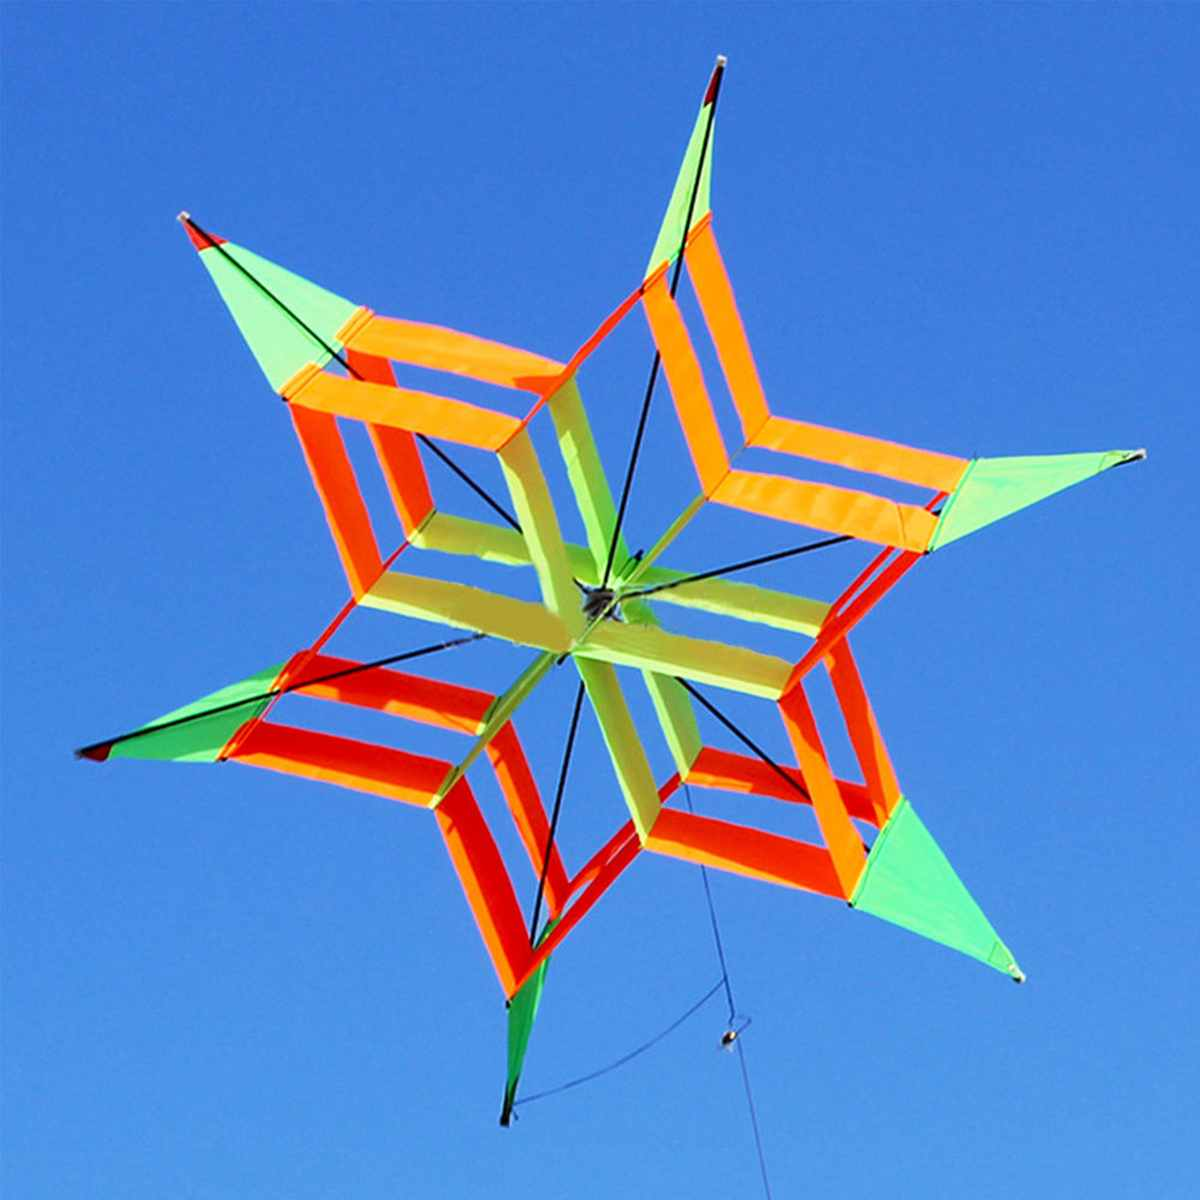 2019 NEW 3D eyes 15m Black 1 Line Stunt Parafoil Octopus Power Sport Kite